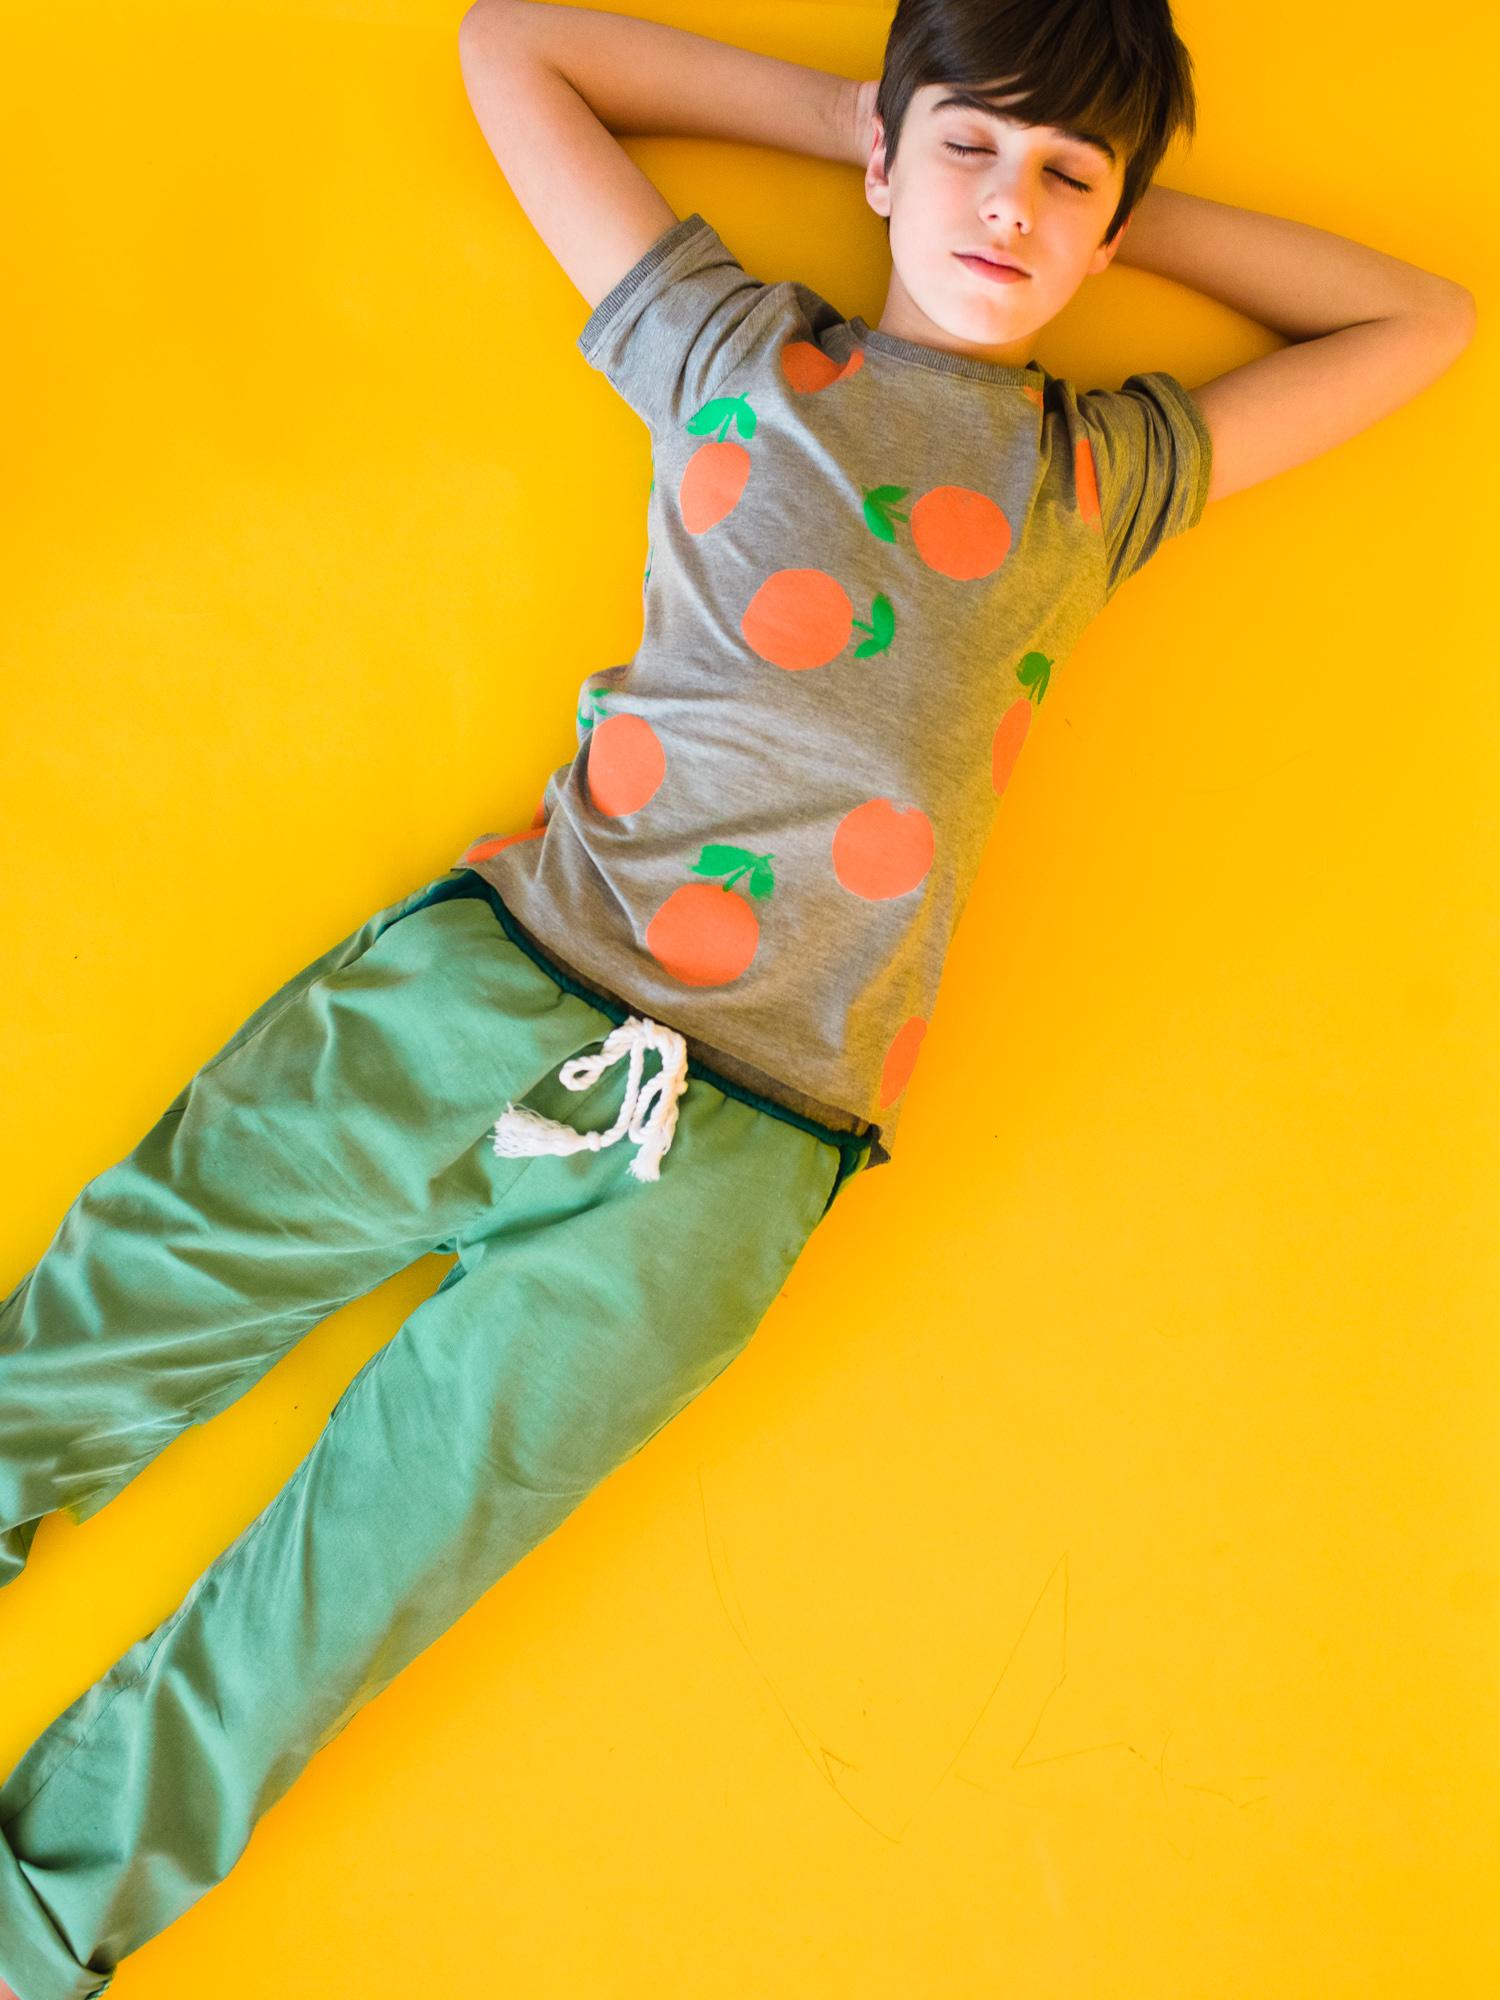 prp-kids-sewing-patterns31.jpg